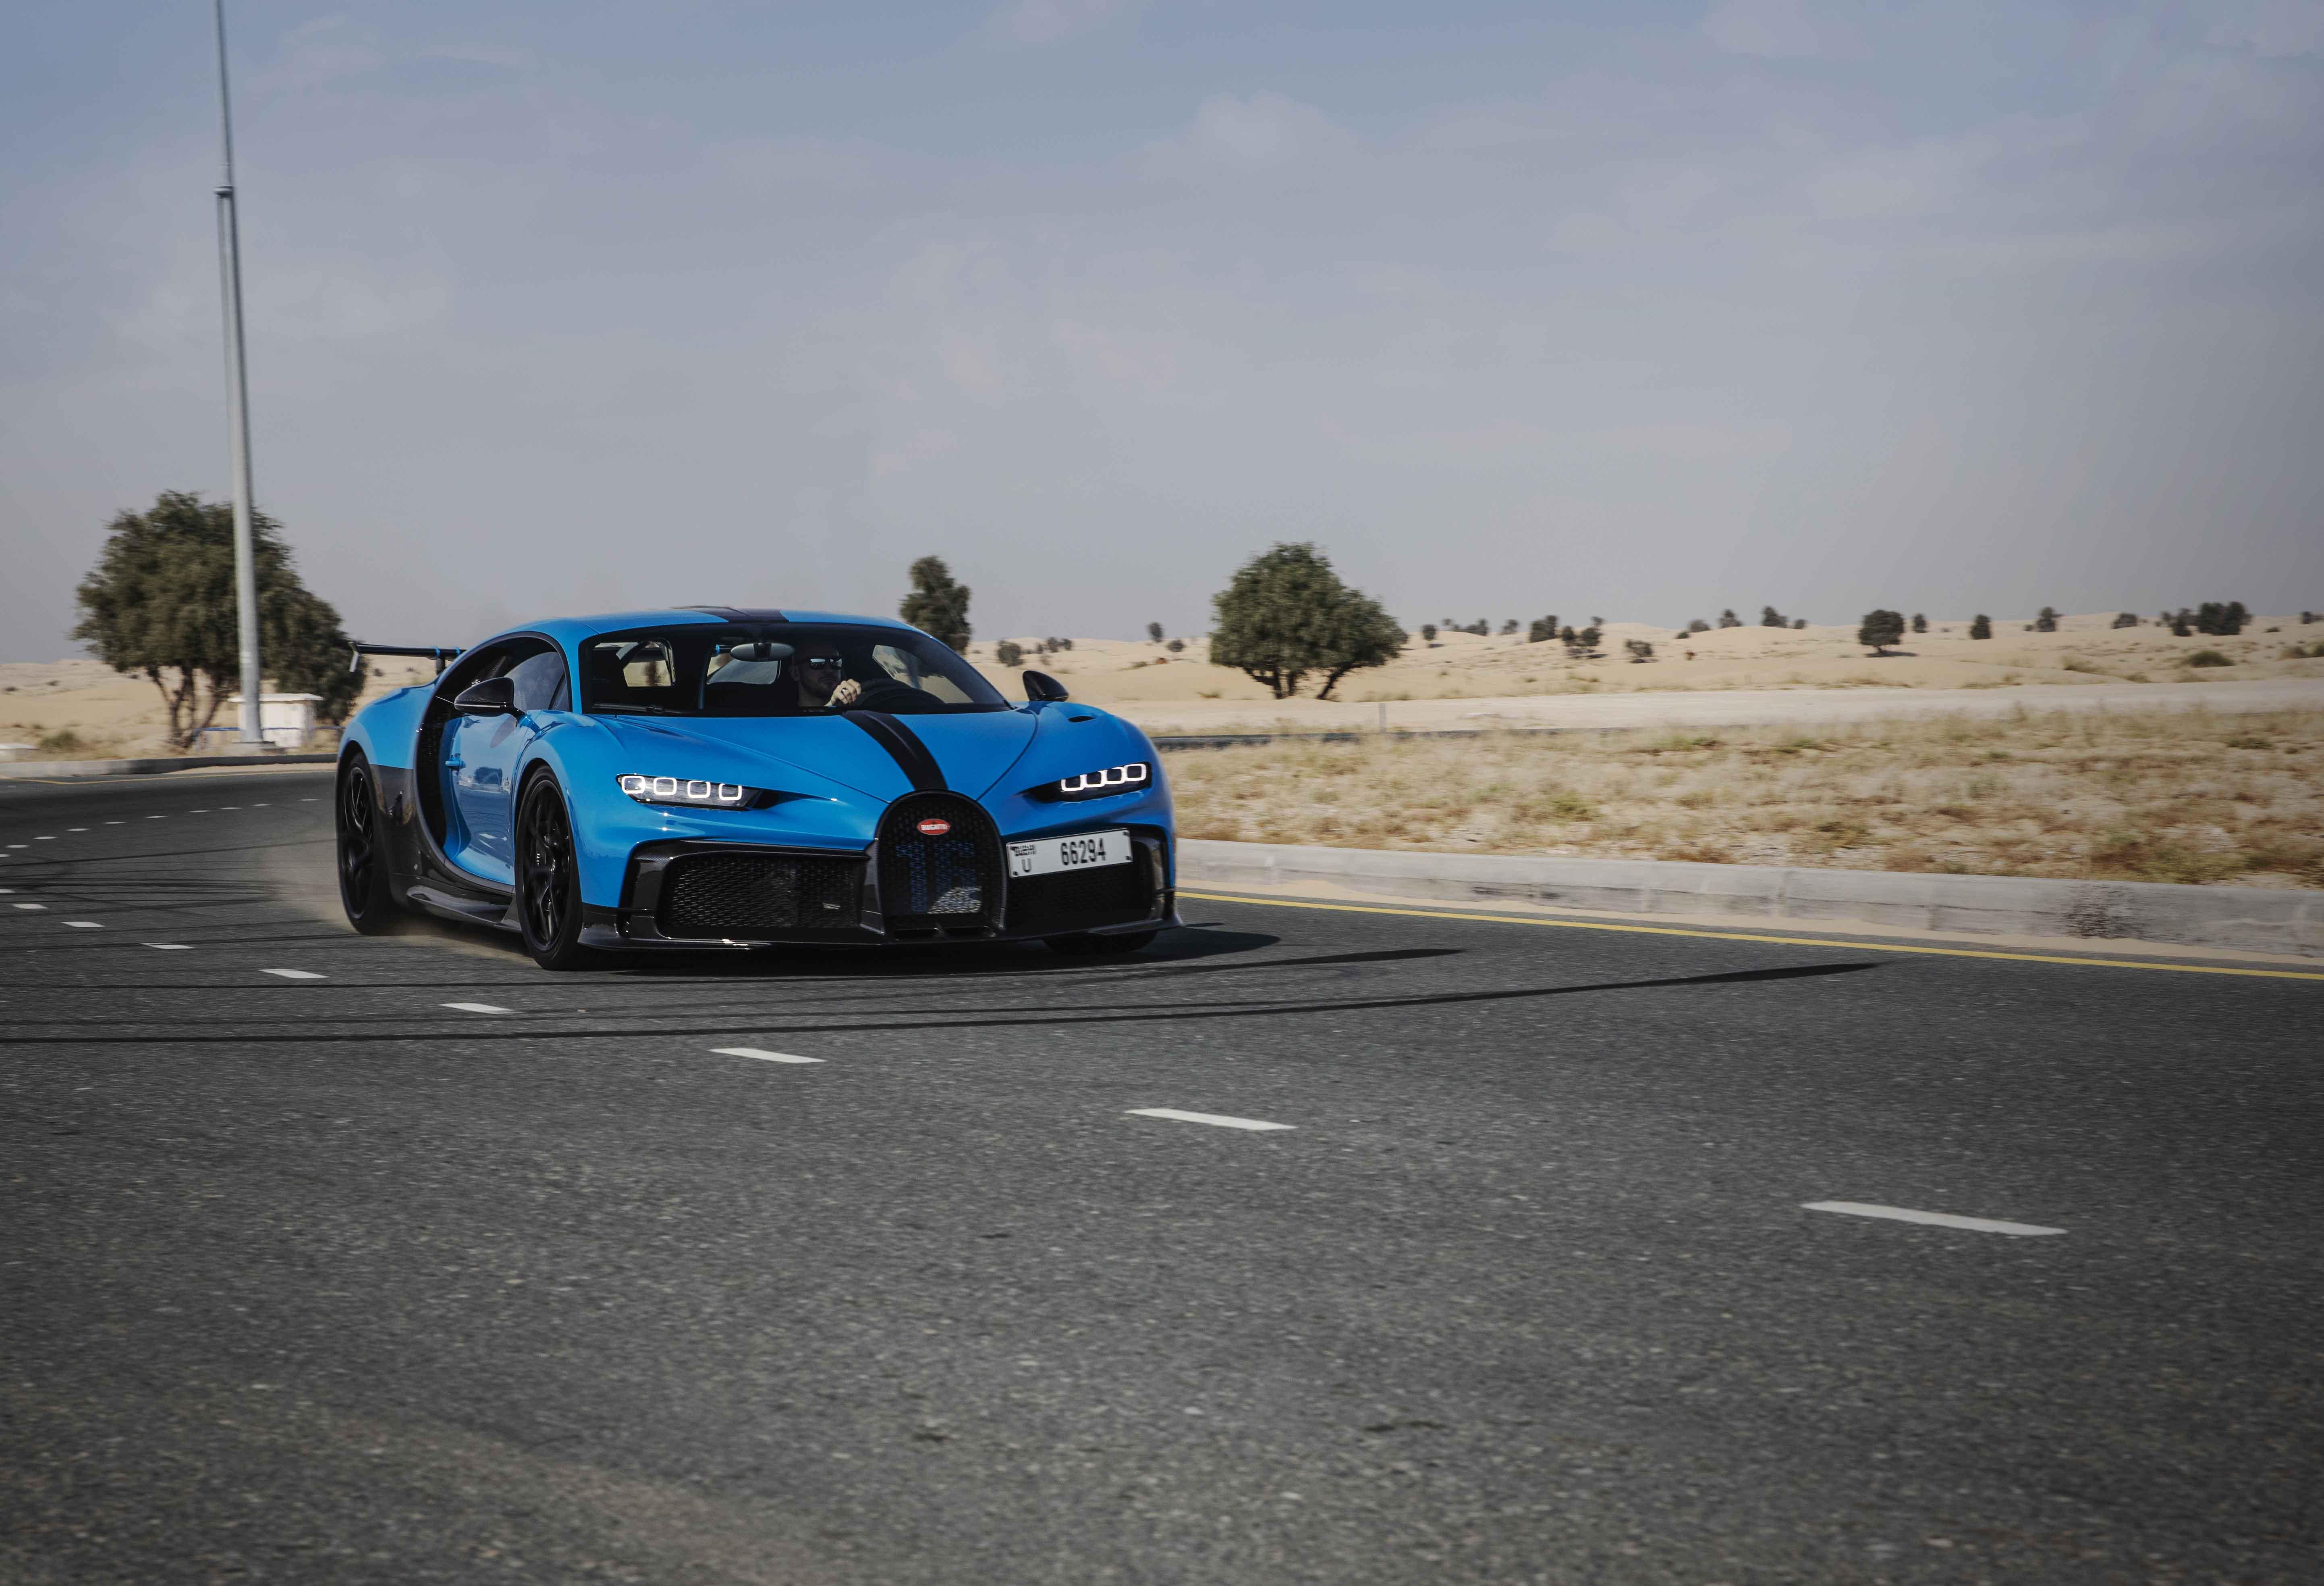 Bugatti Chiron Pur Sport – First Test Drives in Dubai